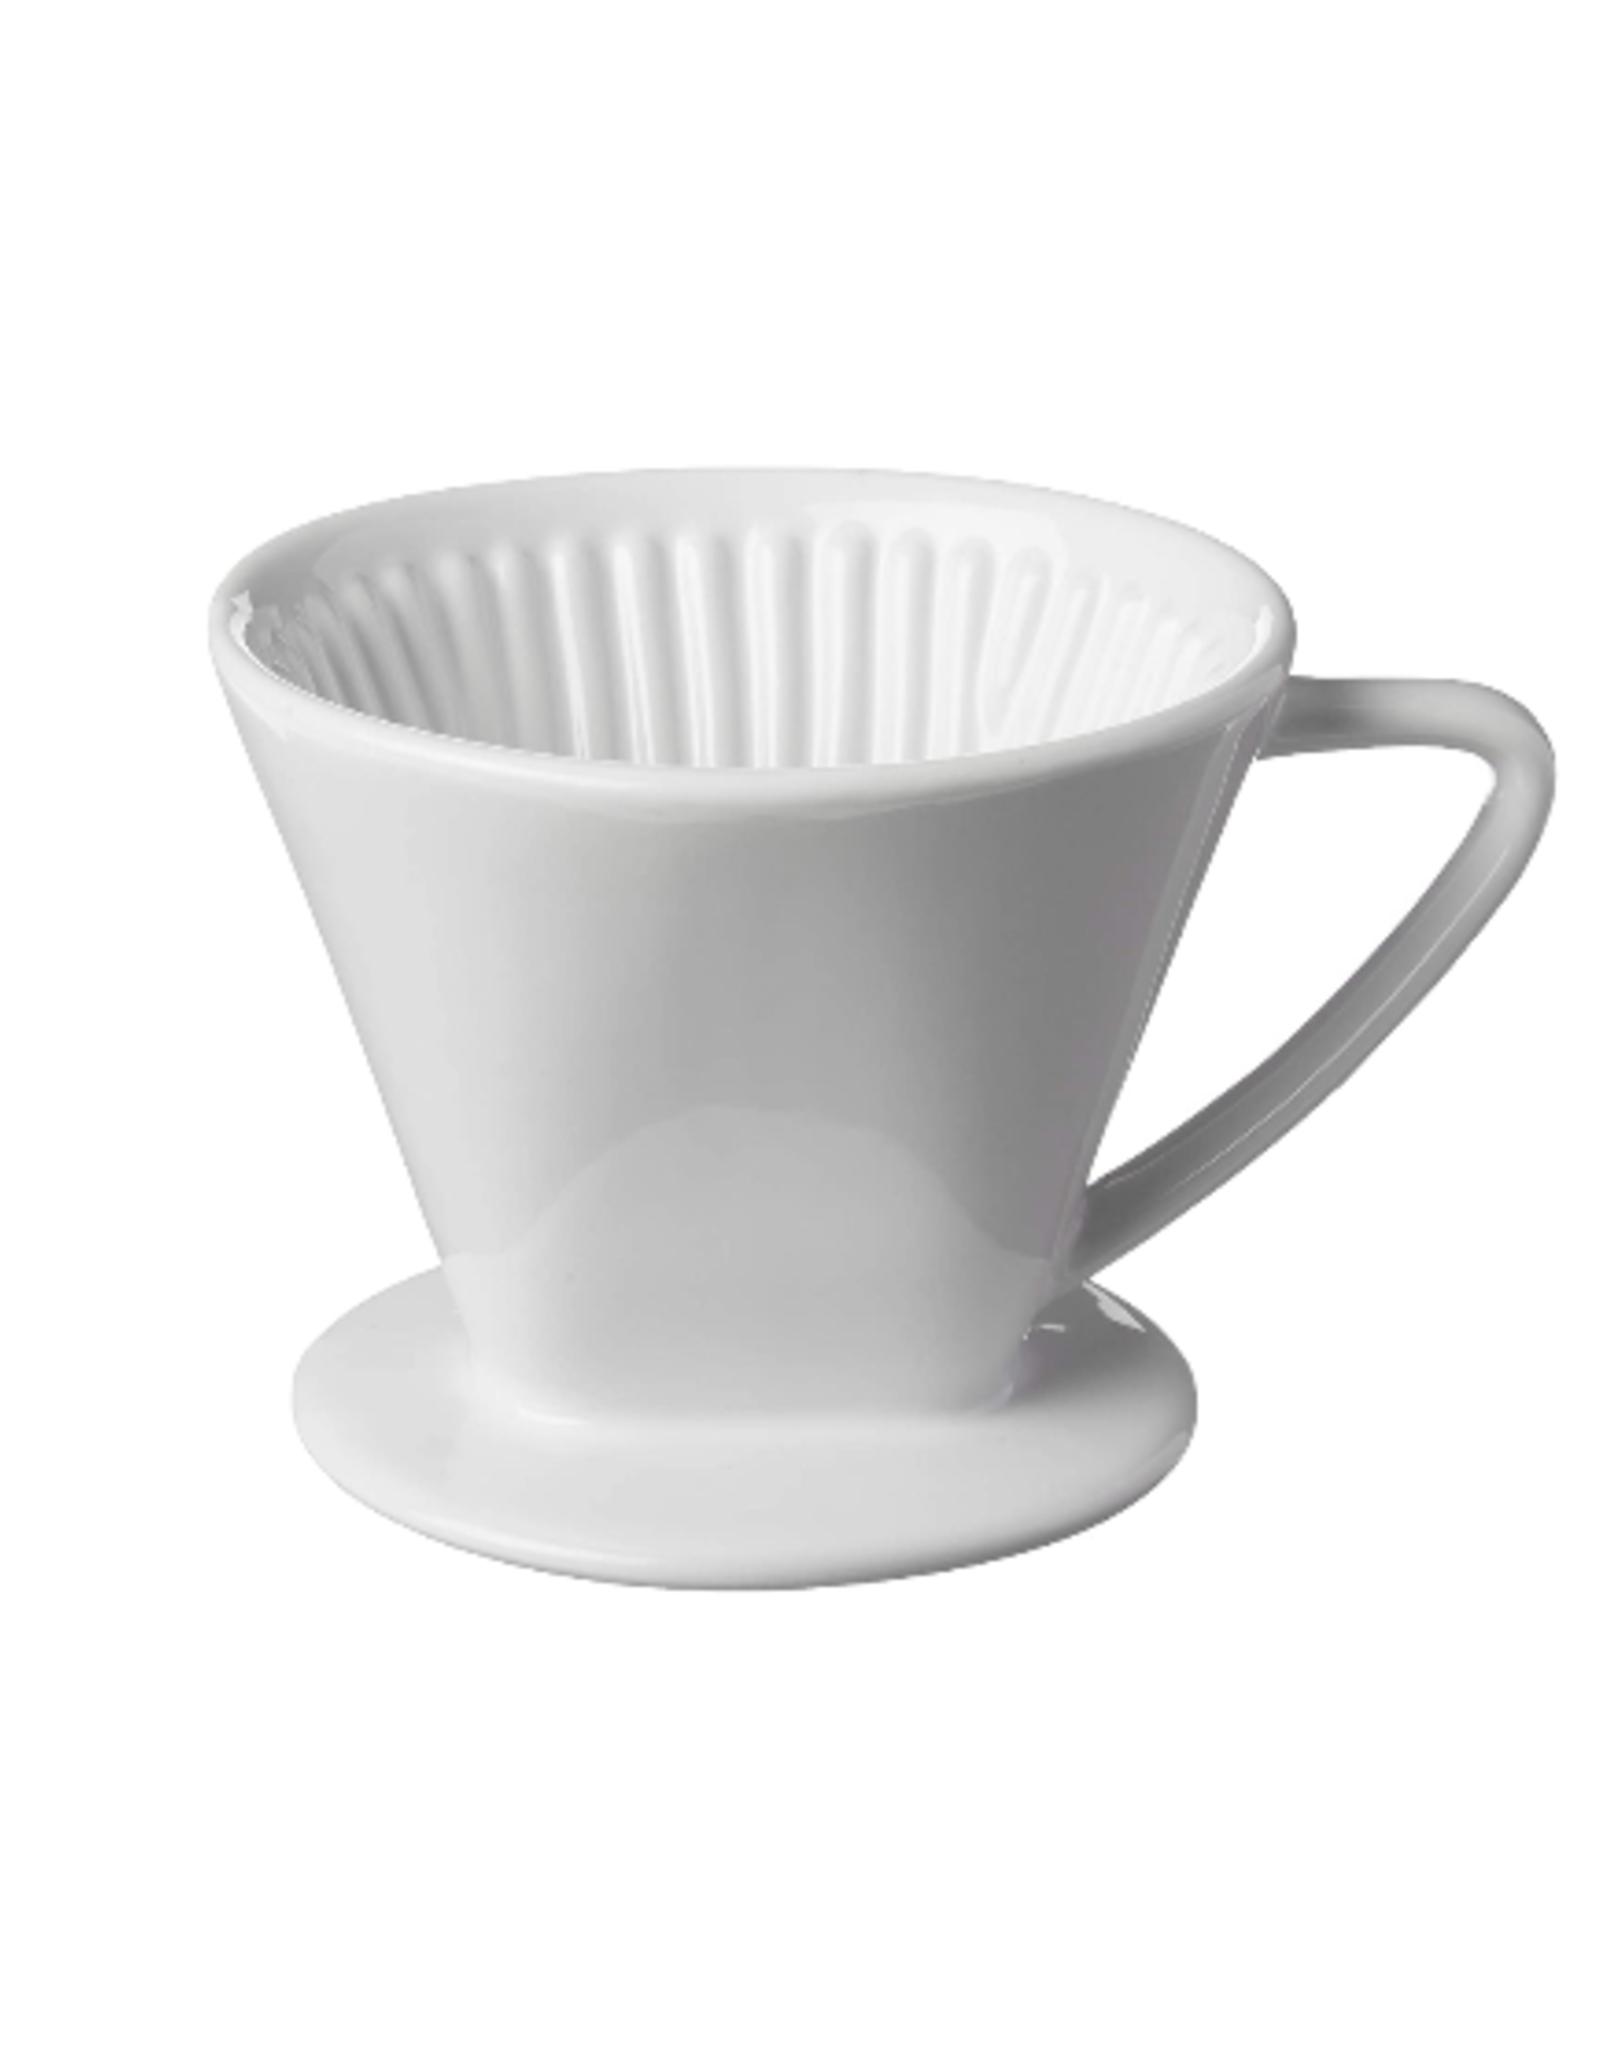 Frieling Porcelain Coffee Filter